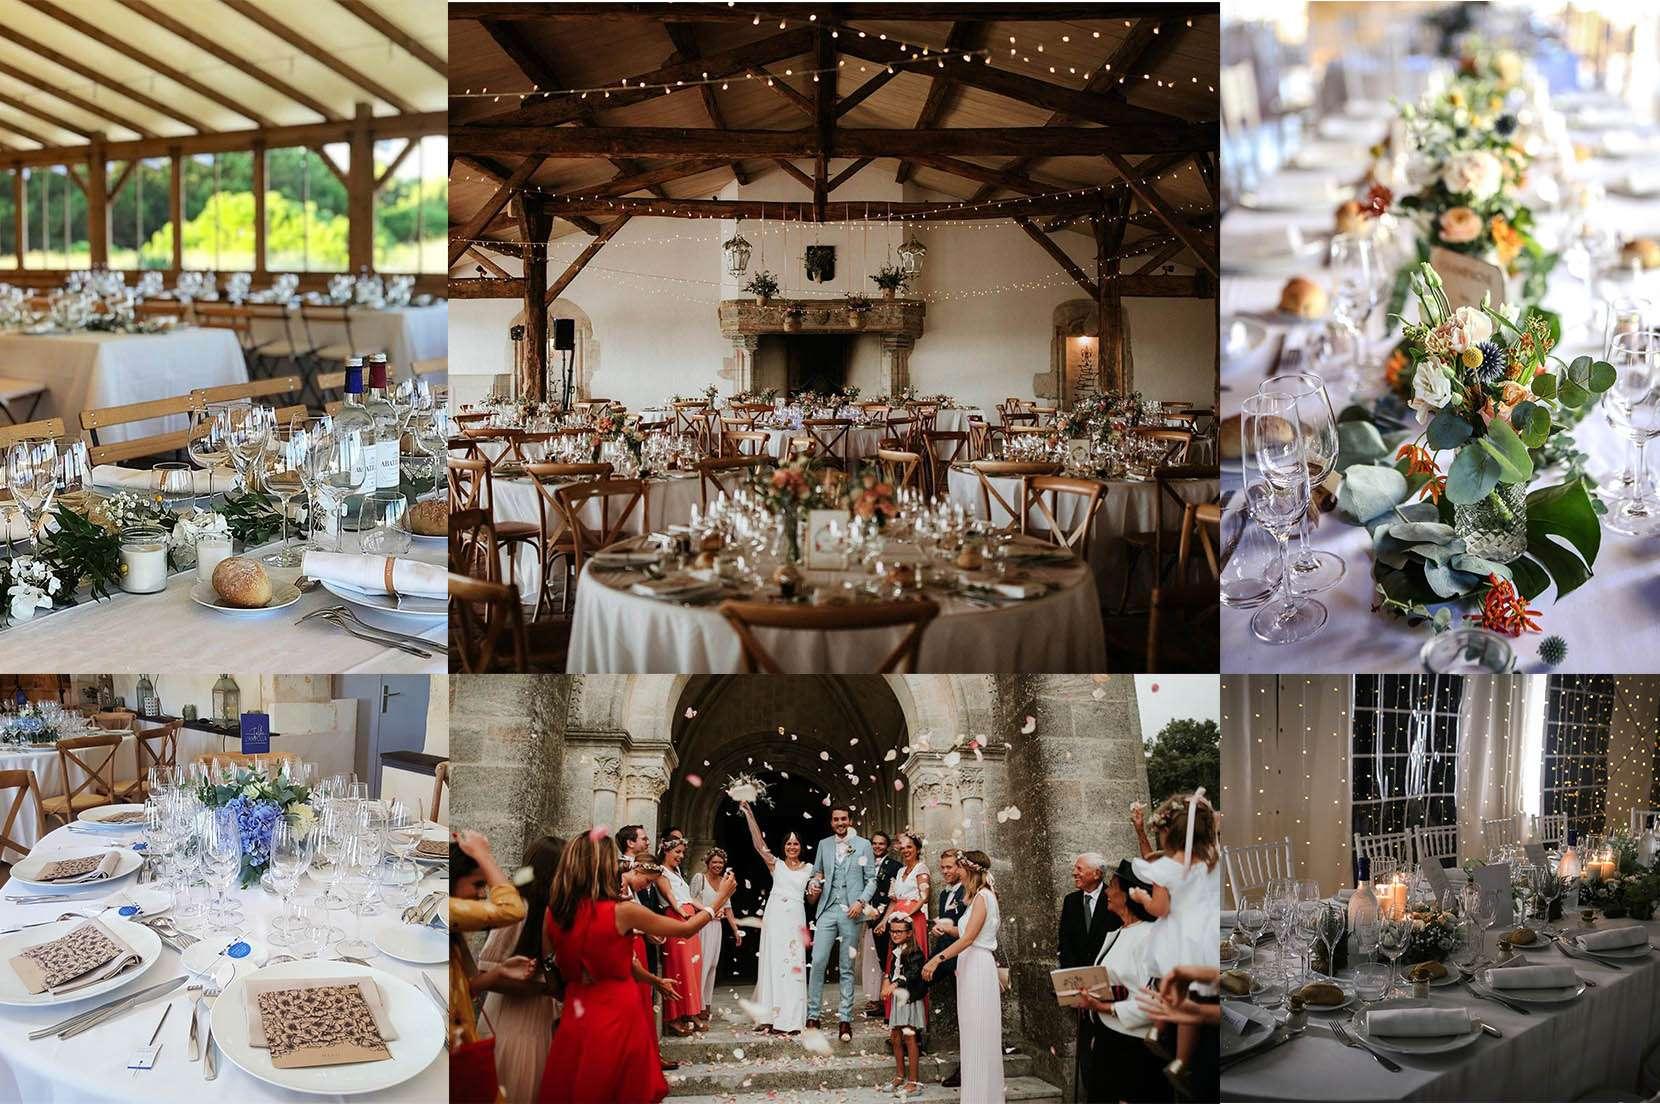 arts-table-deco-mariage-lacoste-1660x1104.jpg